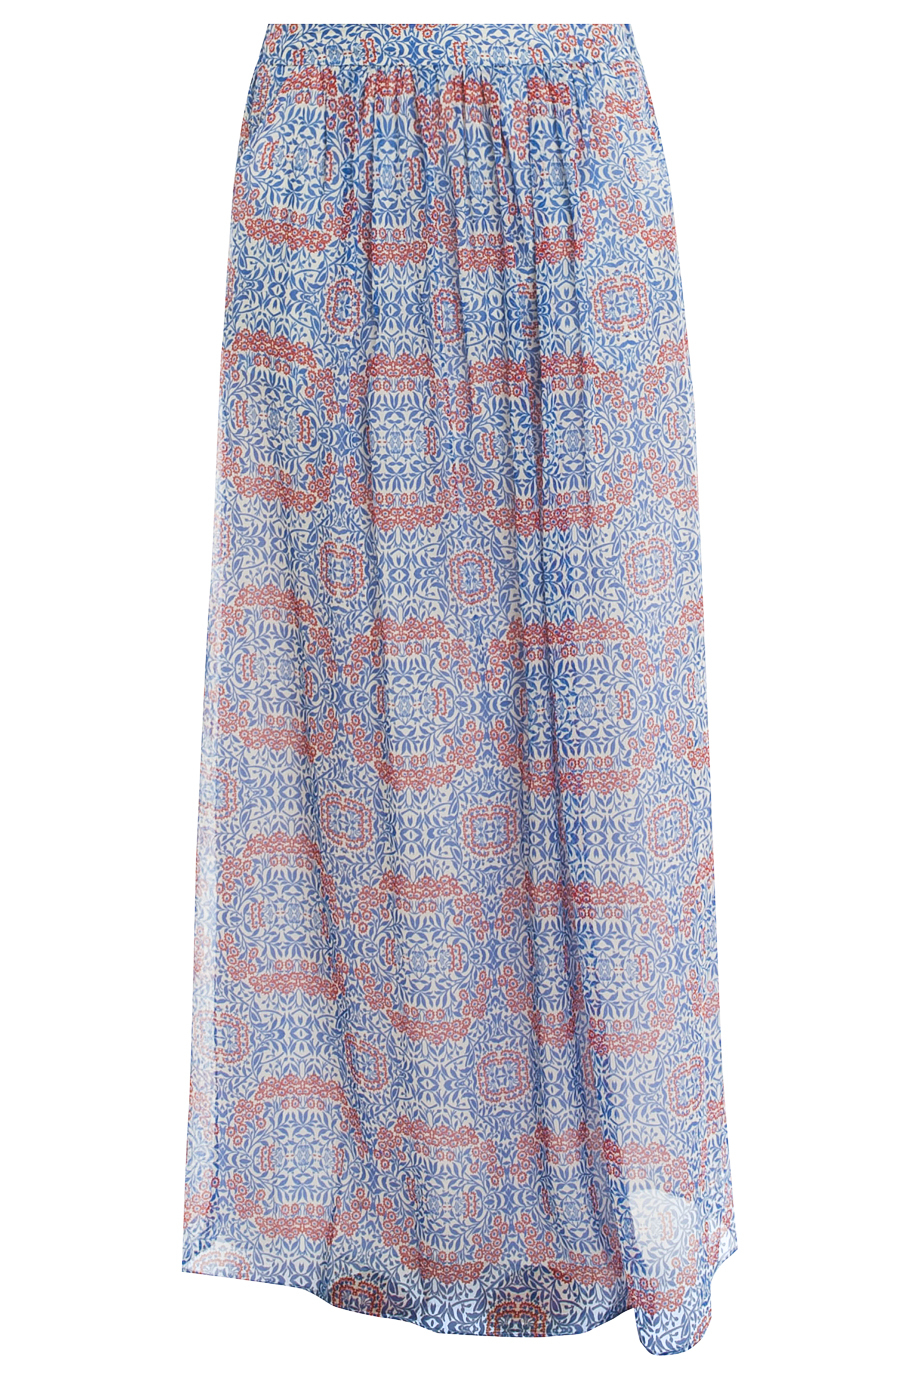 paul joe floral skirt in blue lyst